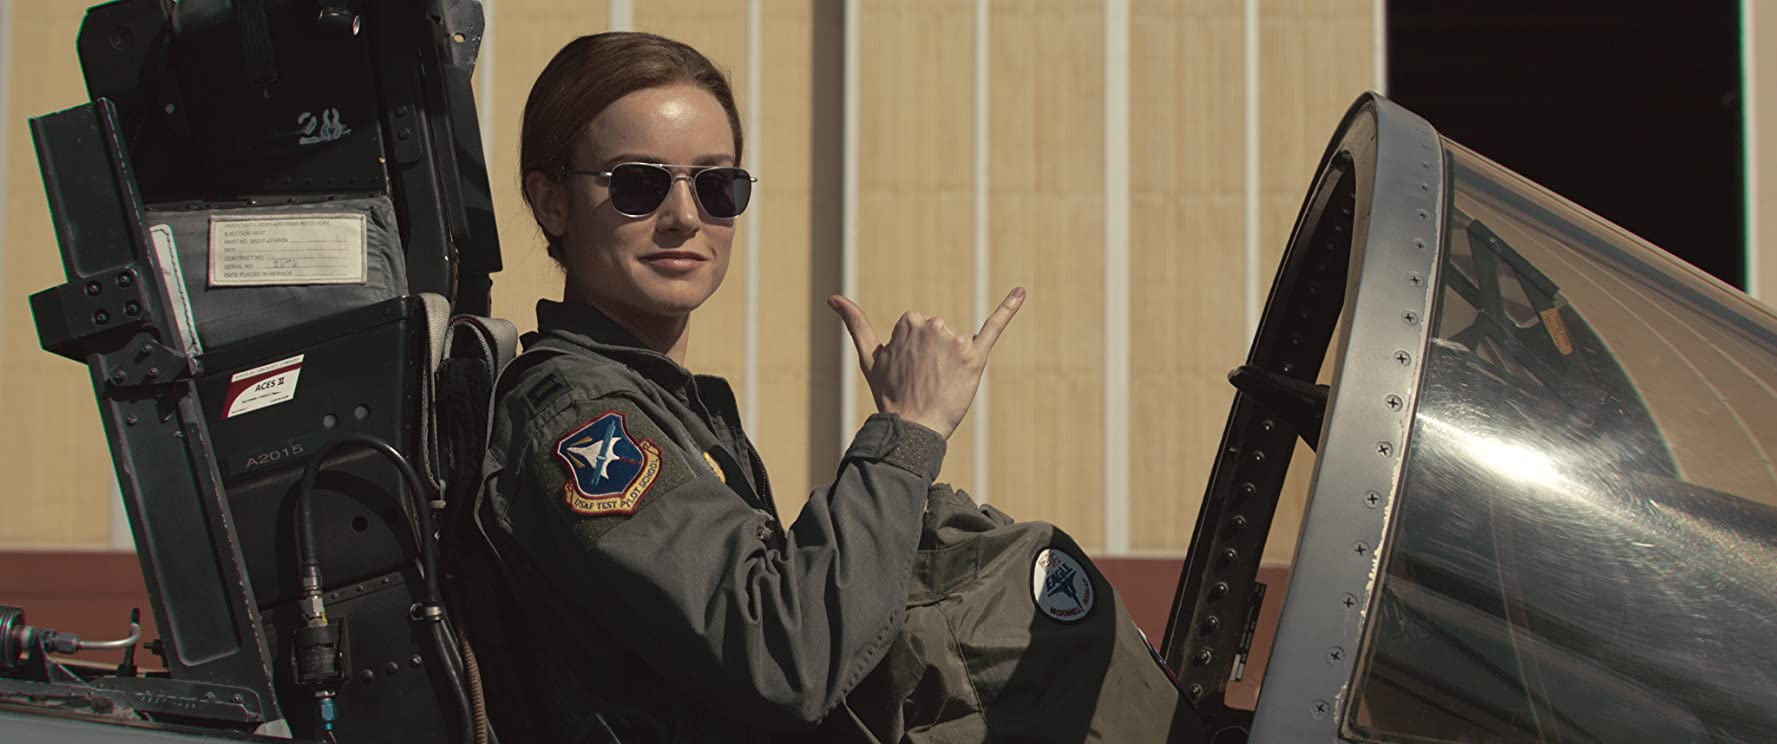 Brie Larson / Captain Marvel / Marvel Entertainment & Walt Disney Studios. © 2019. All rights reserved.